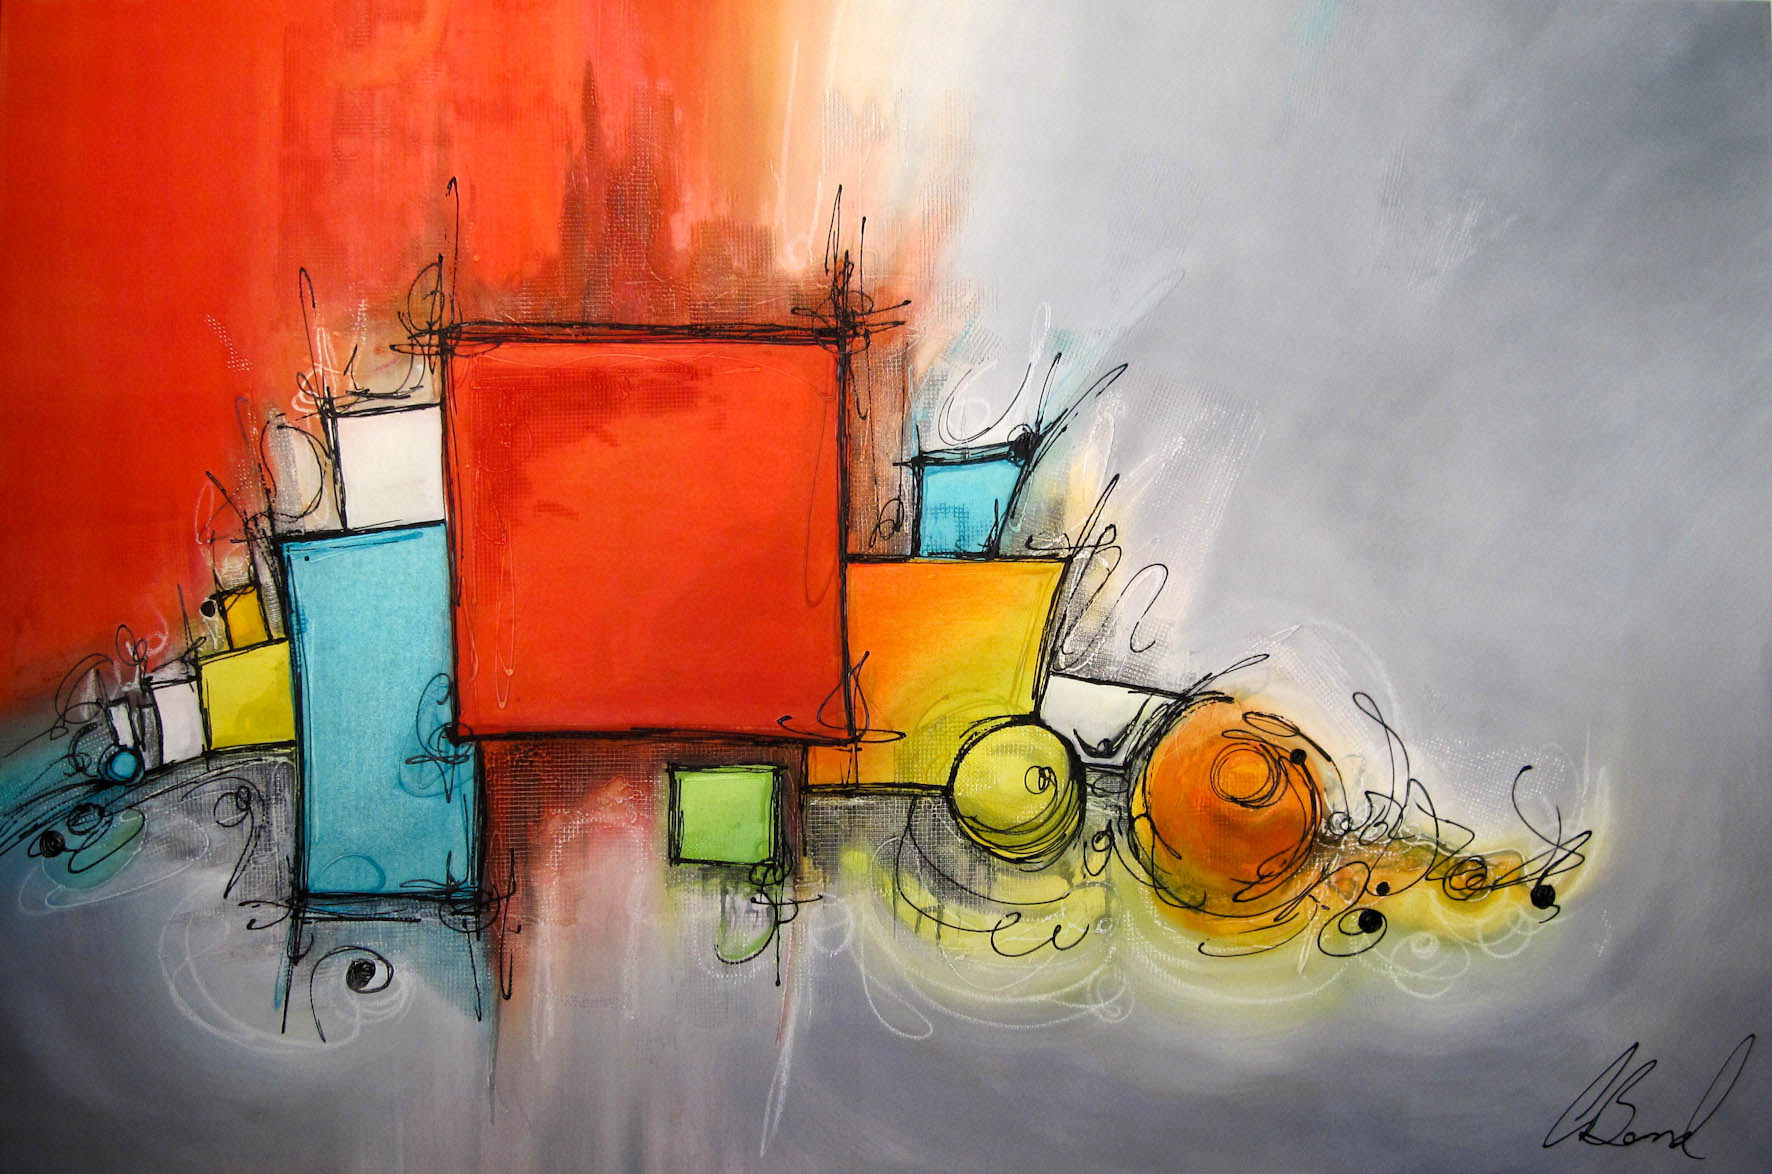 Peinture moderne d 39 art abstrait peinture moderne d 39 art for Art moderne peinture